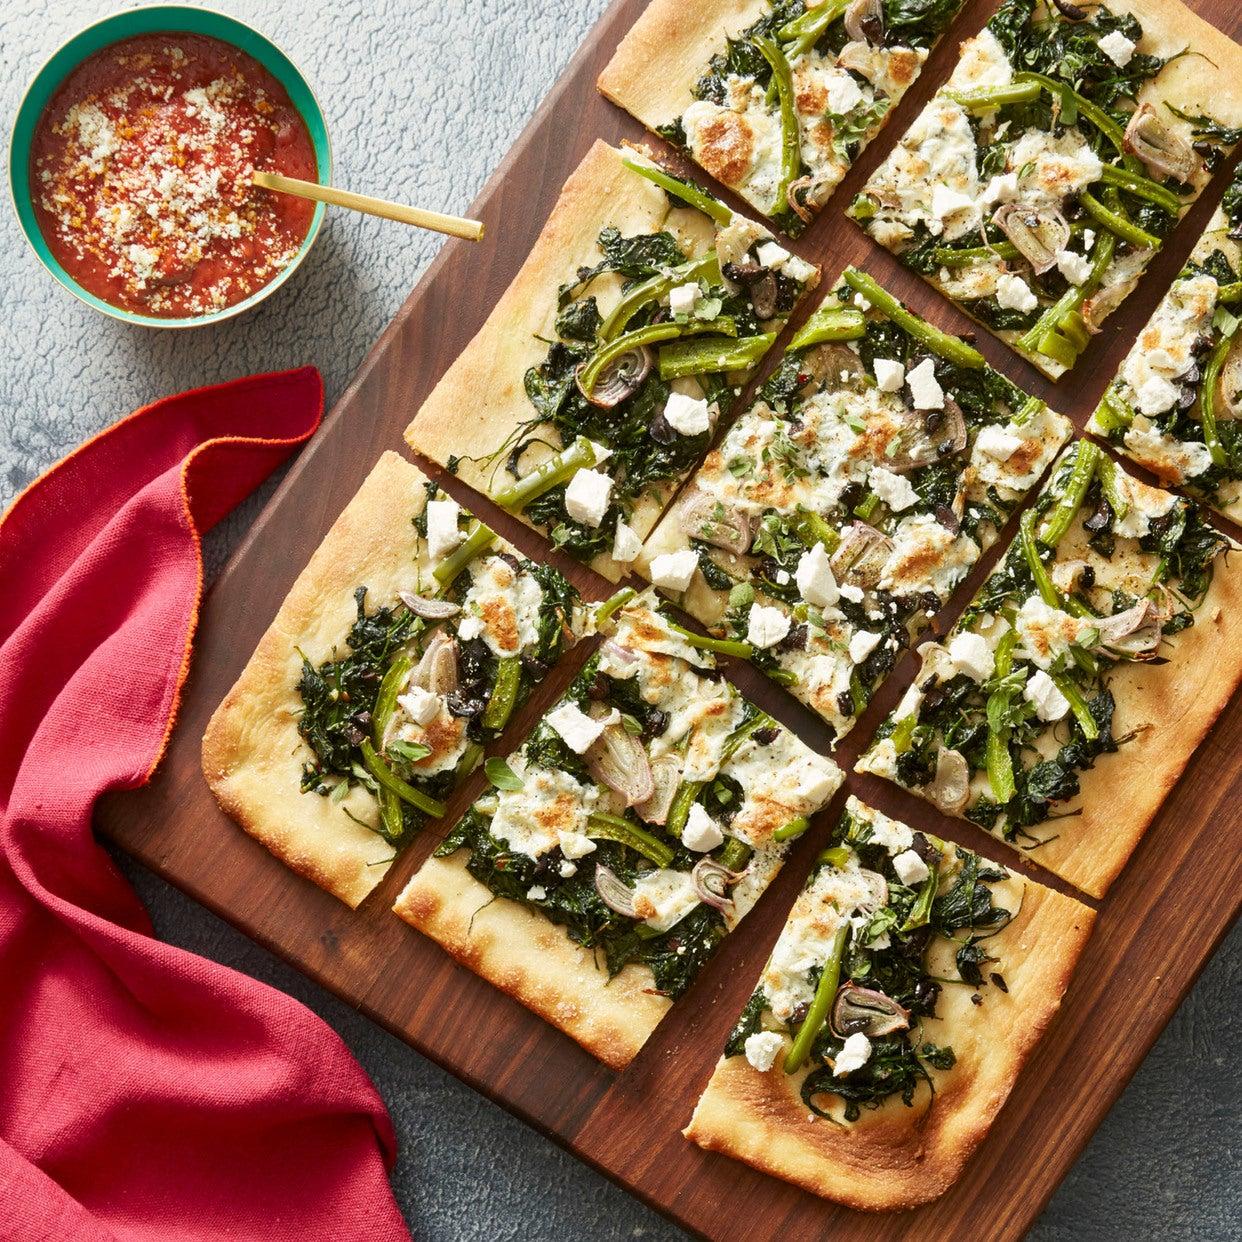 Spinach & Fresh Mozzarella Pizza with Olives, Bell Pepper & Ricotta Salata